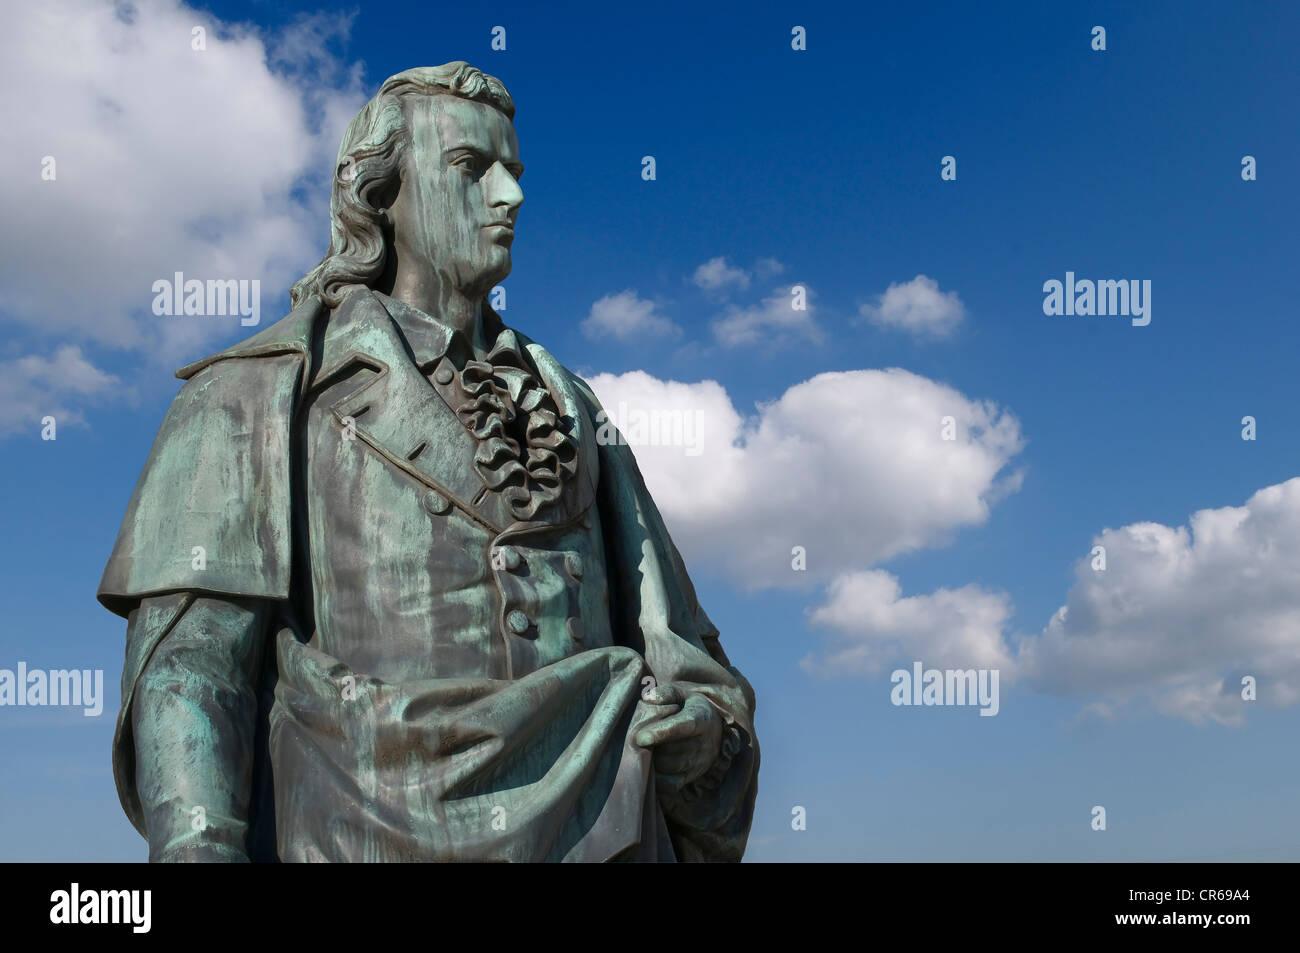 Patinated bronze statue, Schiller monument in the Furtwaenglergarten park, Salzburg, a UNESCO World Heritage Site, - Stock Image